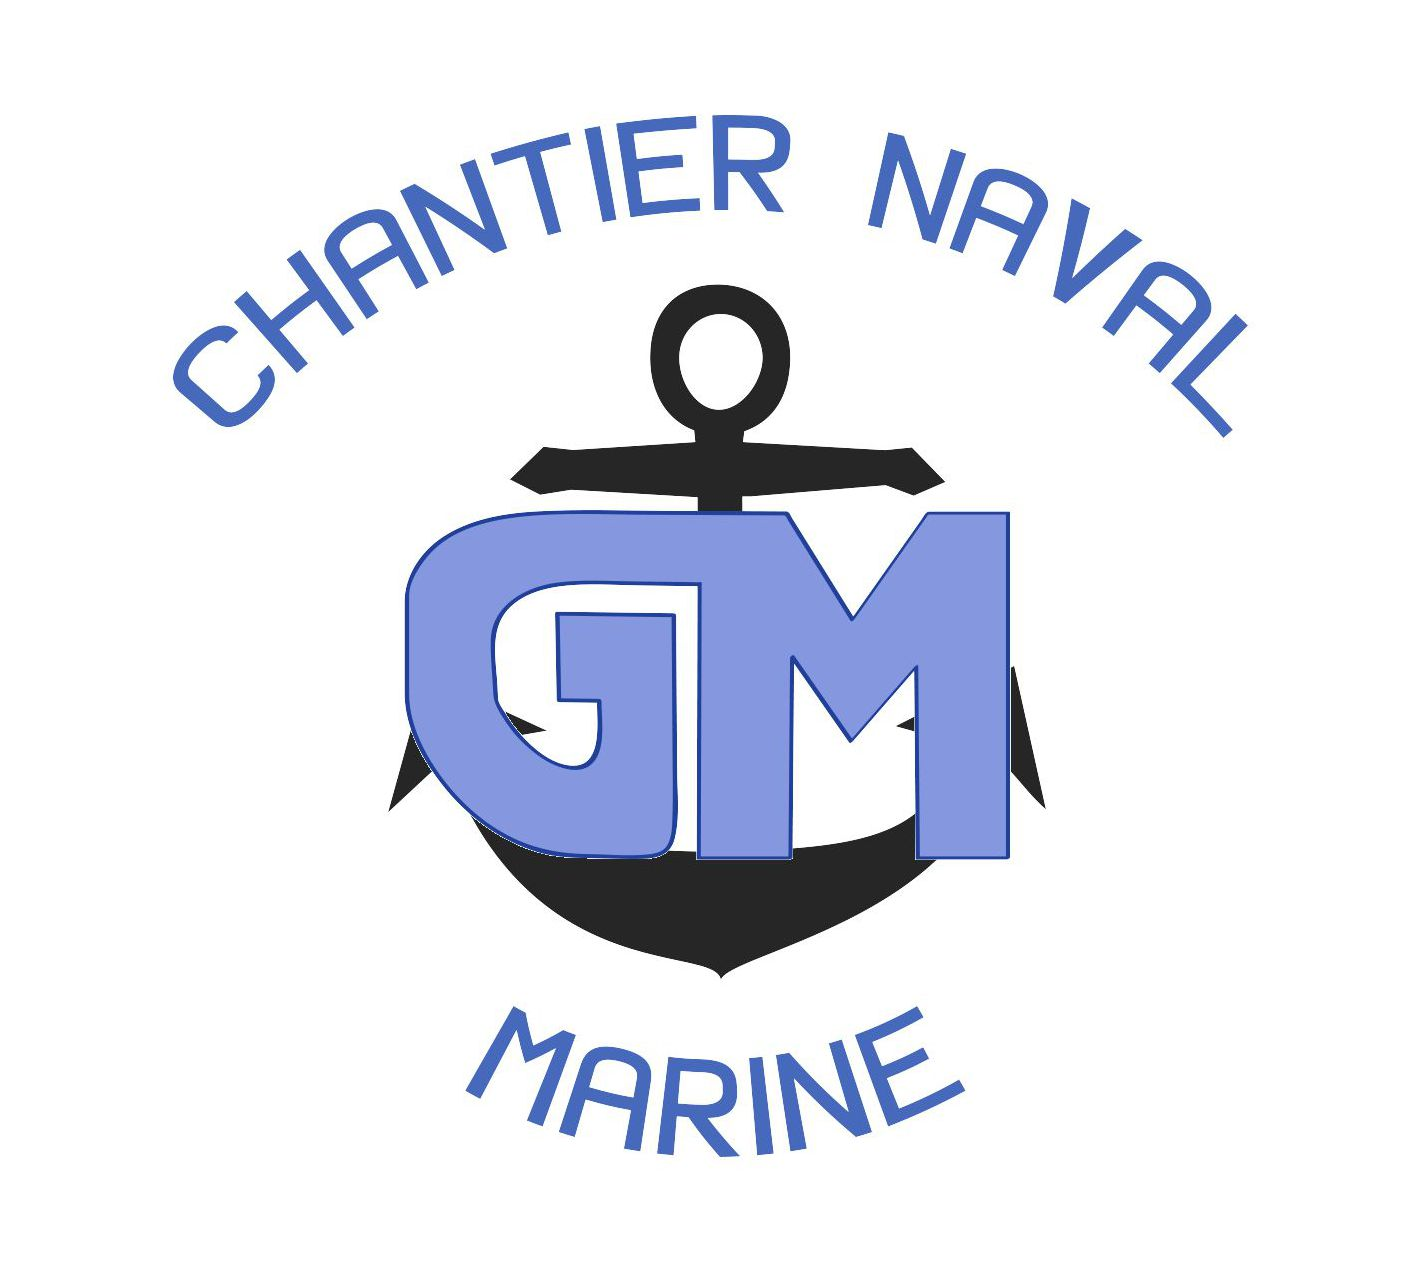 Chantier naval GM Marine